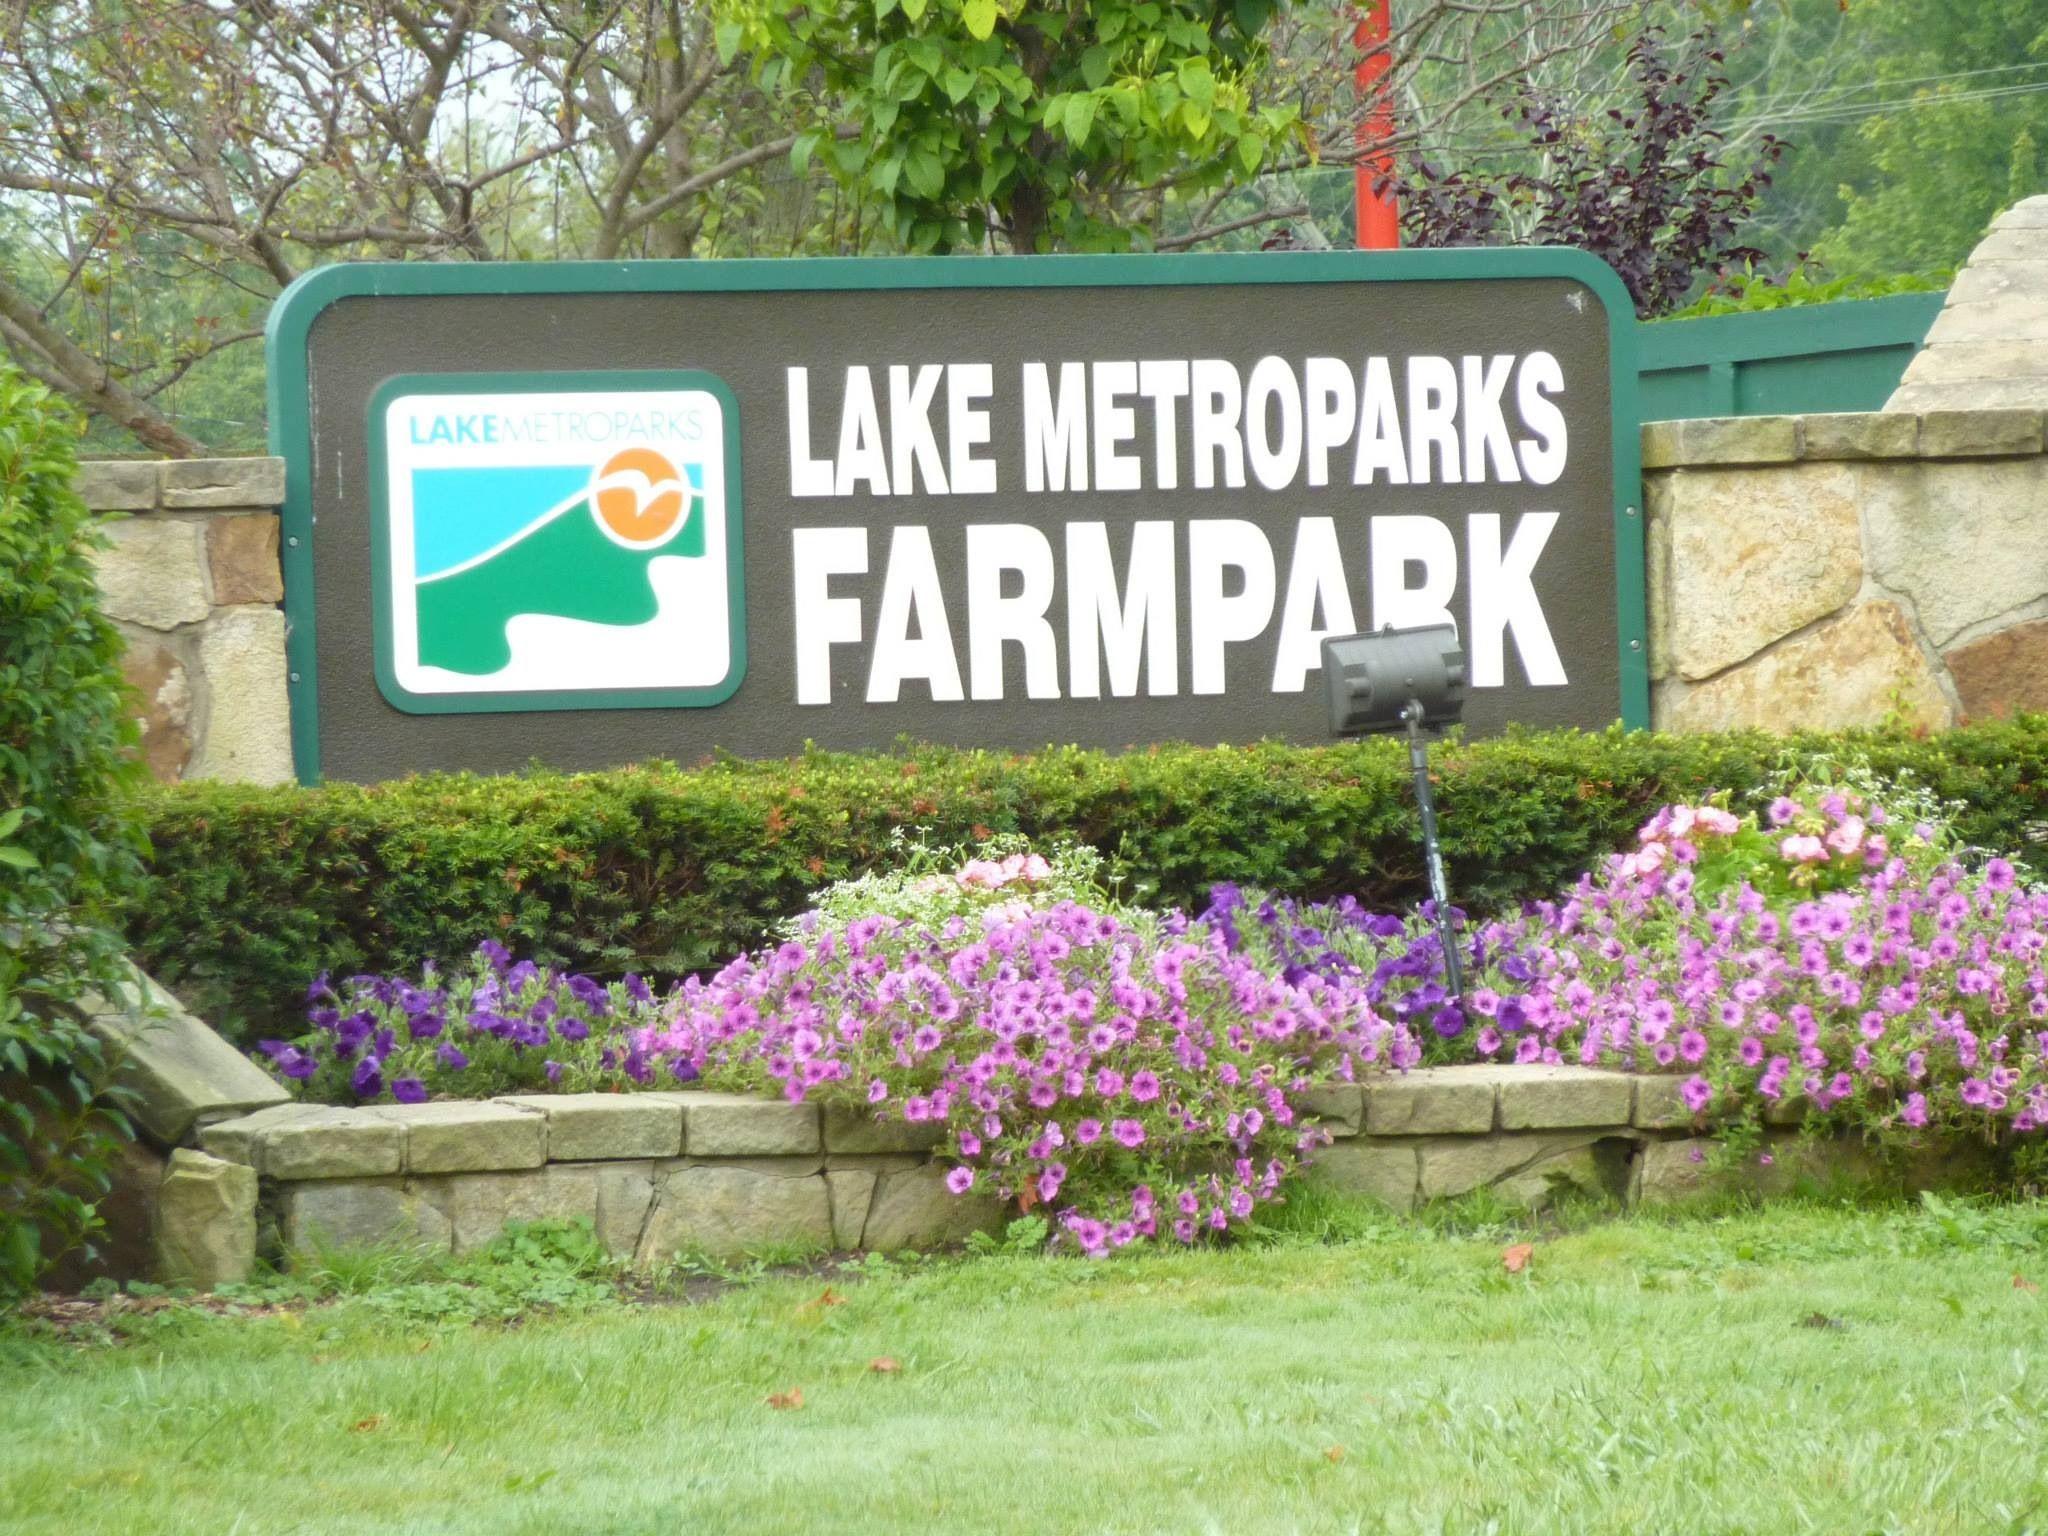 Lake Metroparks Farmpark Kirtland Ohio Kirtland Ohio Lake Kirtland